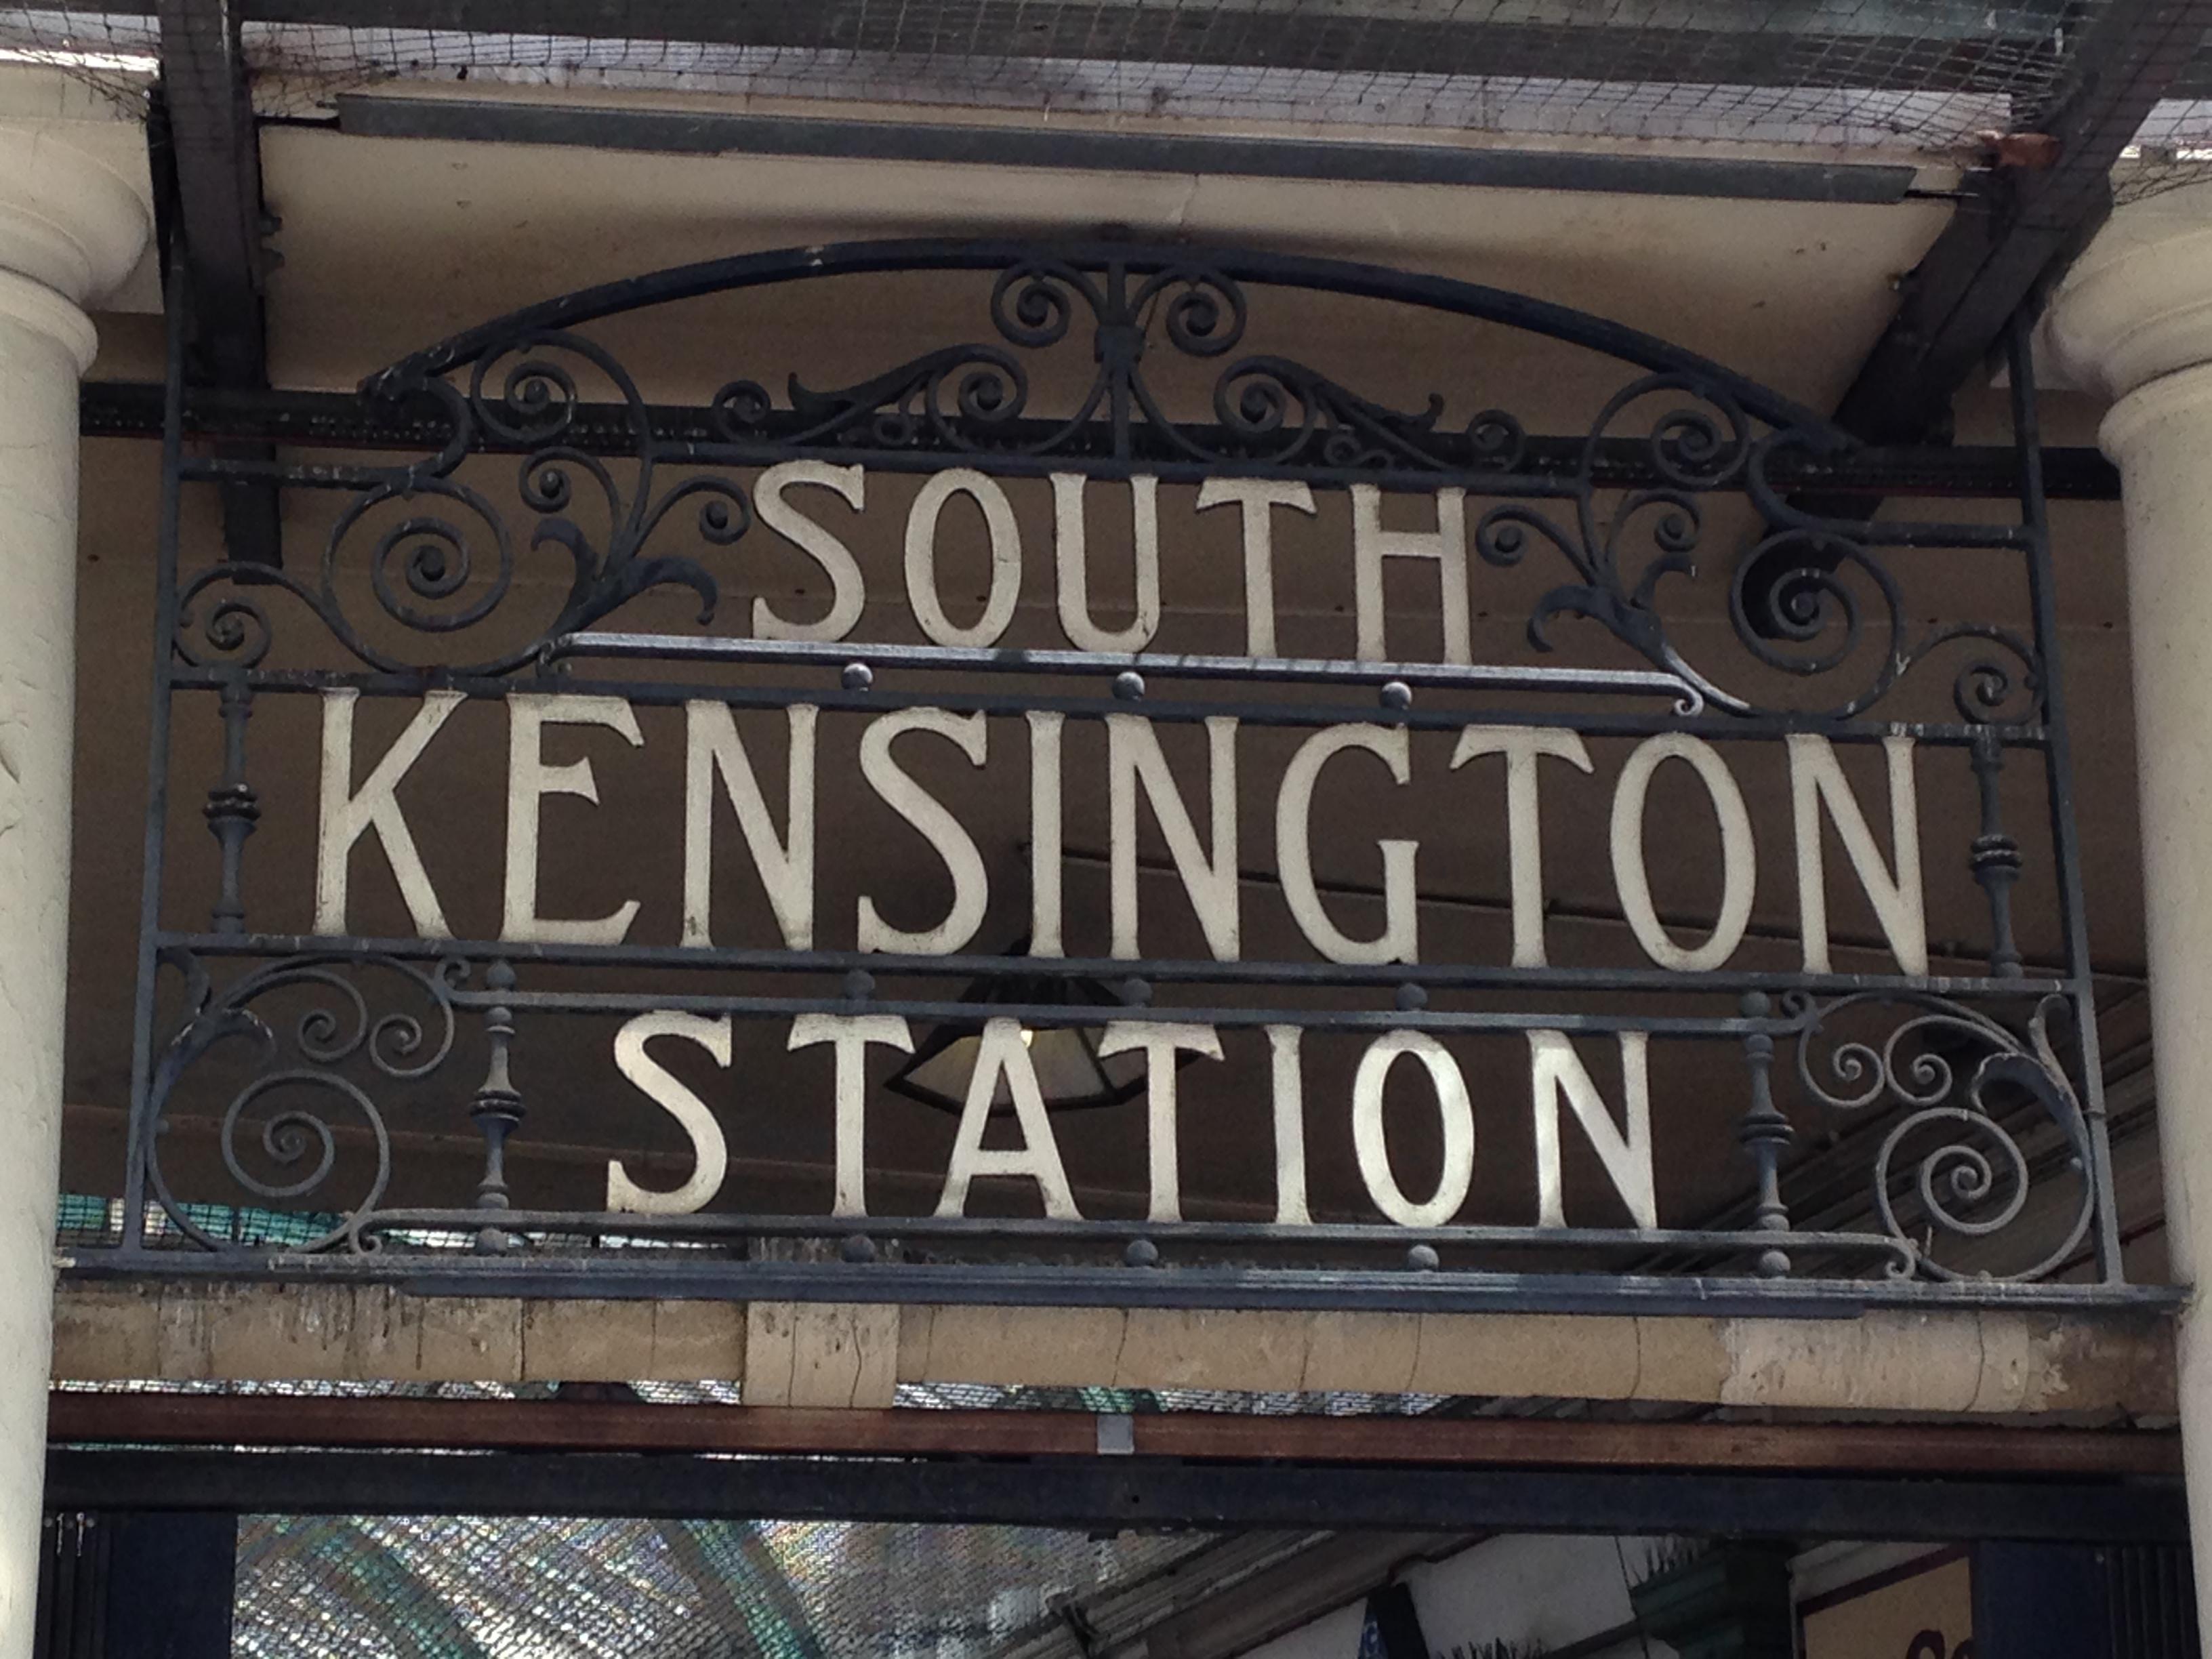 Let our journey in Kensington, London begin!